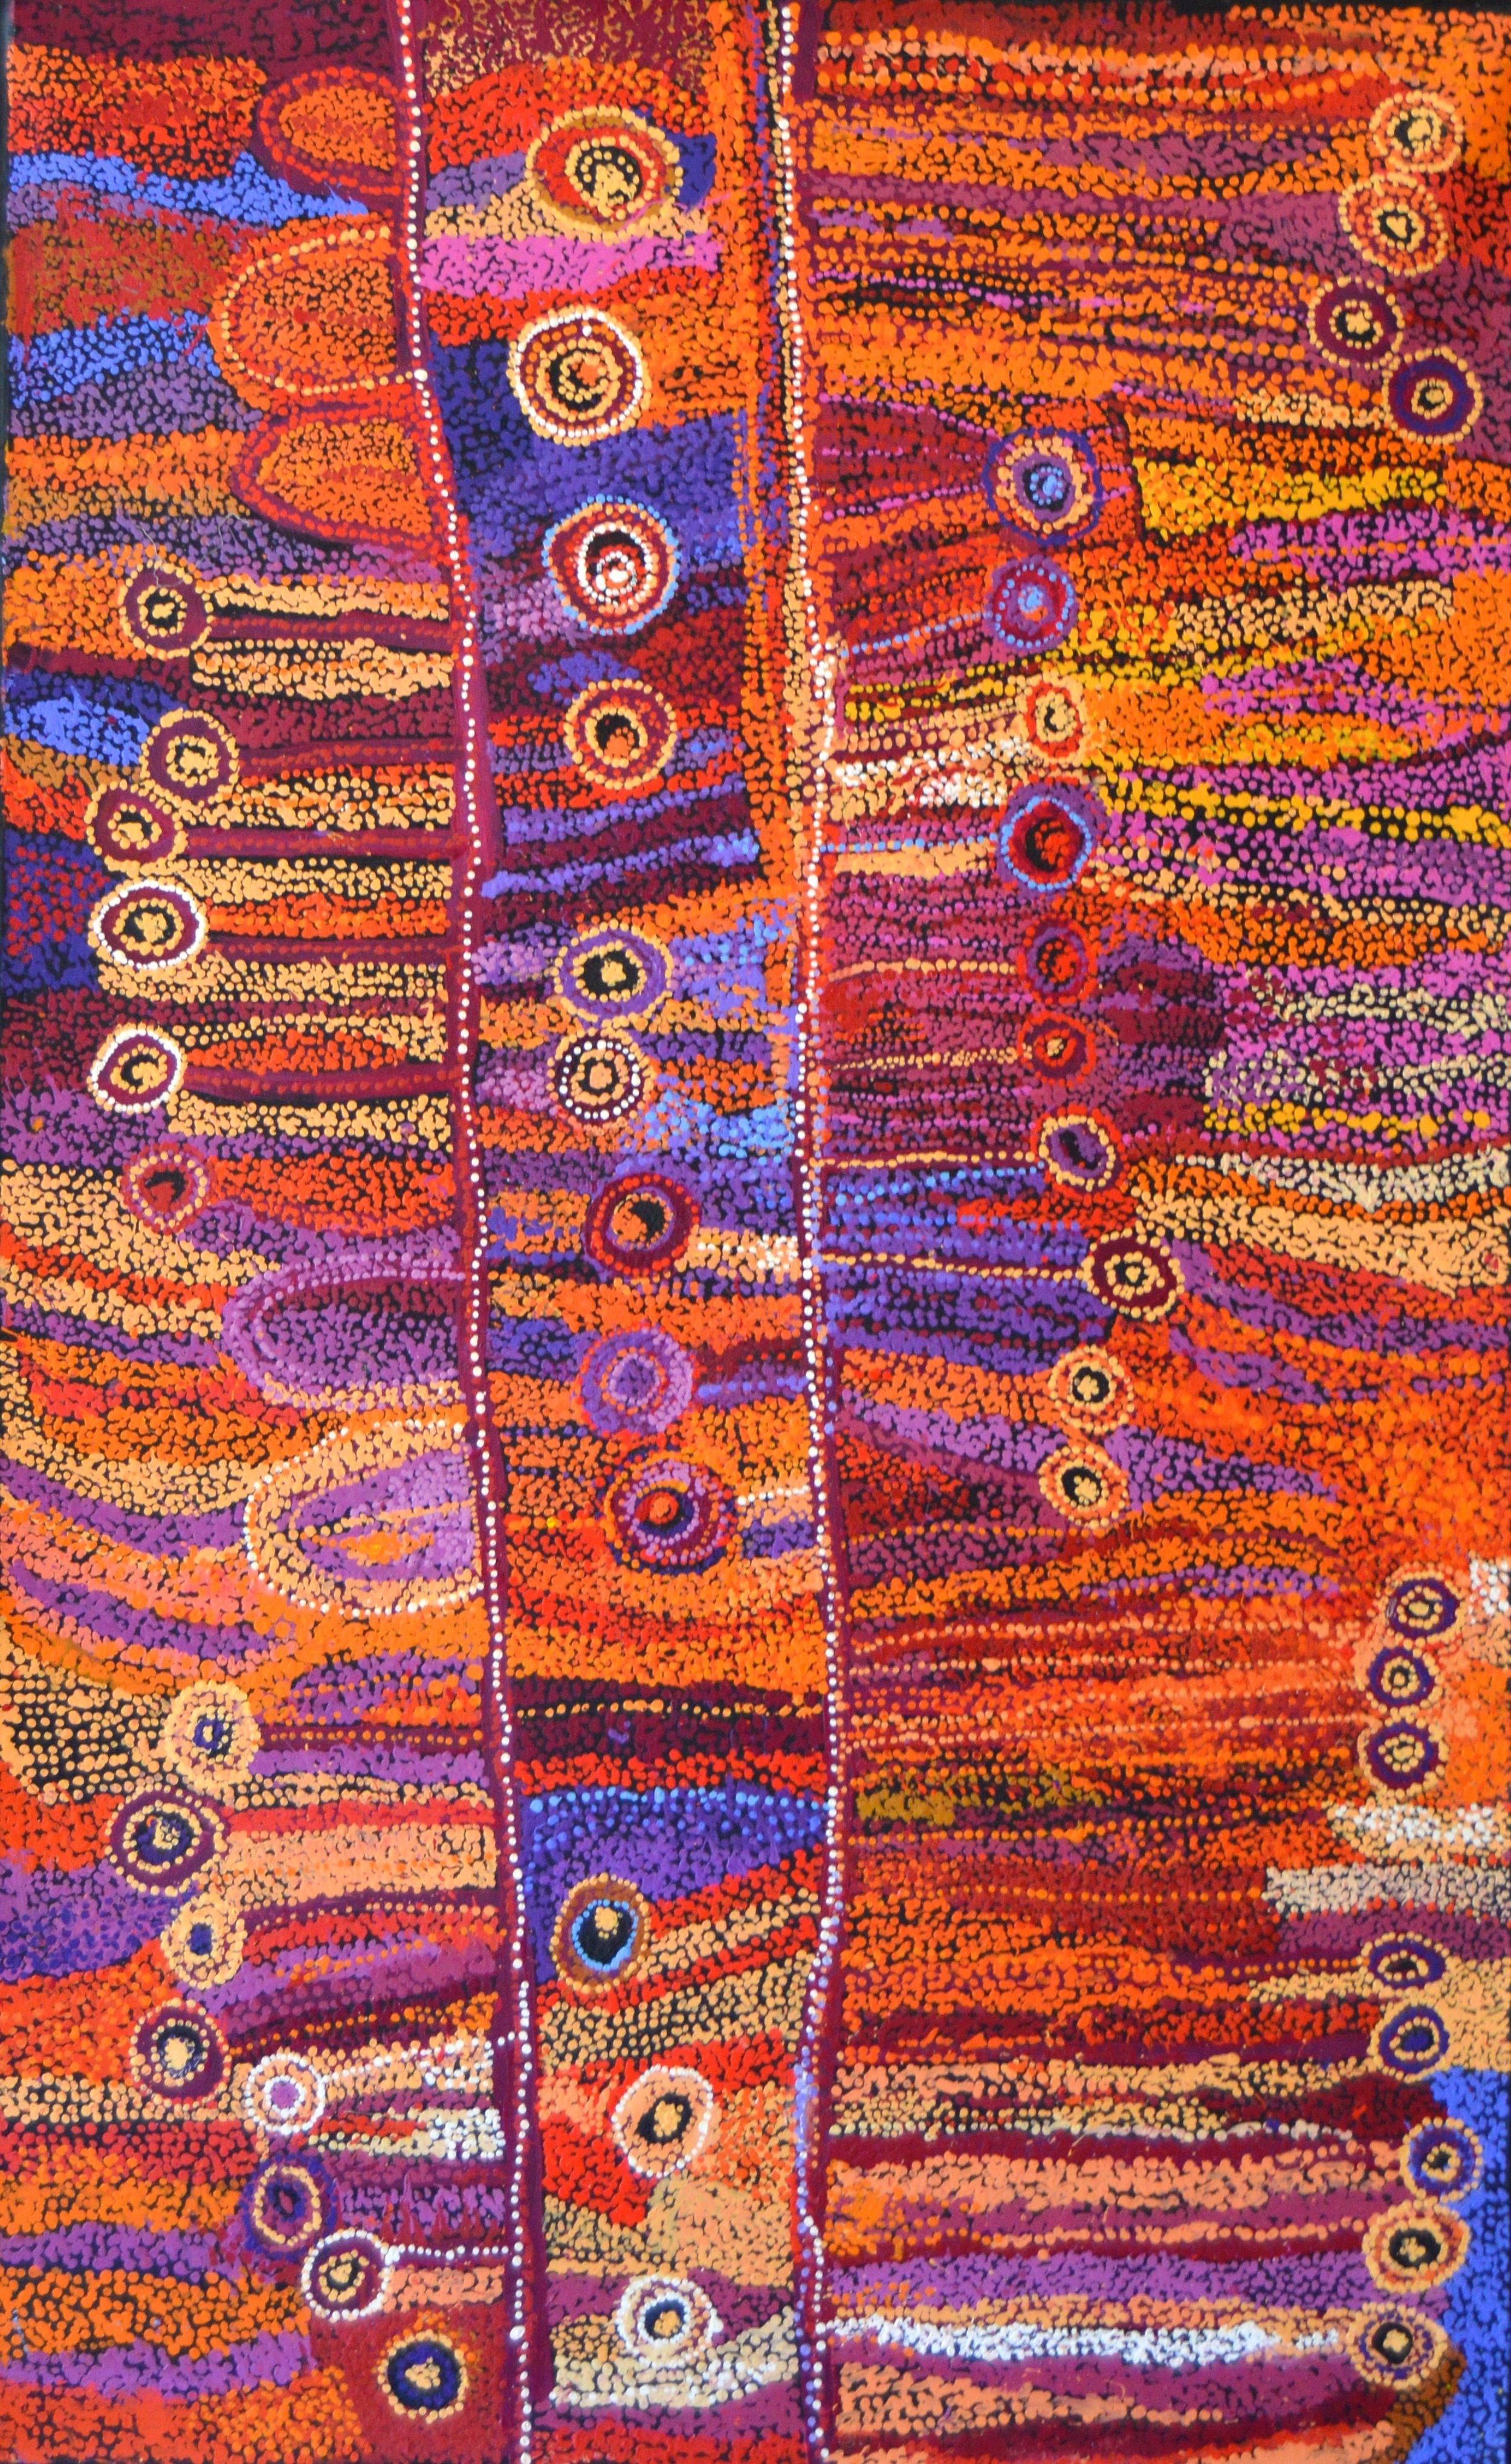 "Wawiriya Burton  Ngayuku ngura- My Country   Acrylic on Belgian linen 1525 x 1980 mm (60 x 78"") Tjala Arts Catalog #485-15   Price Available upon Request"